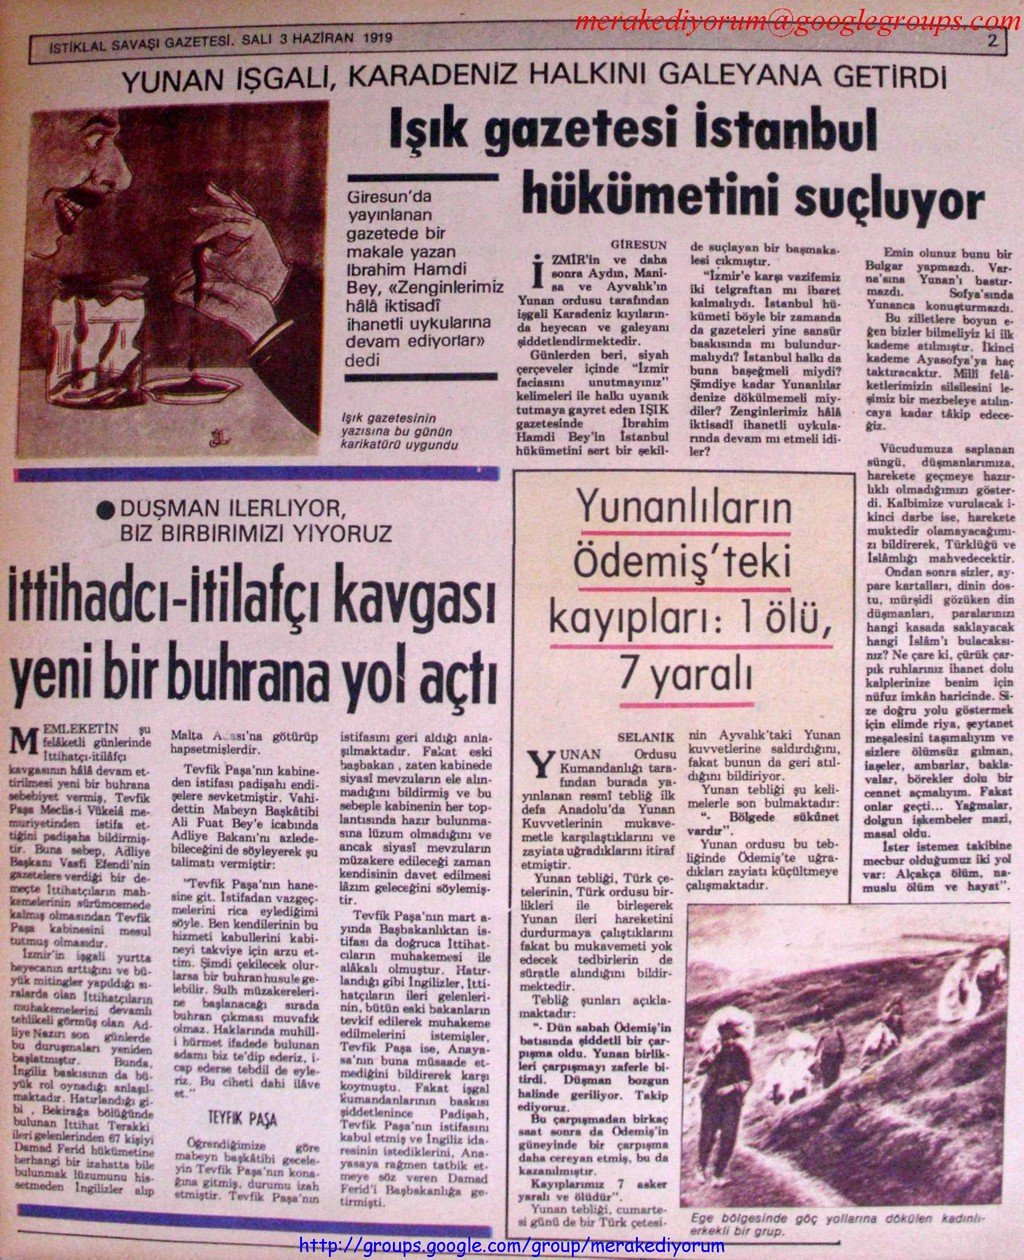 istiklal savaşı gazetesi - 03 Haziran 1919